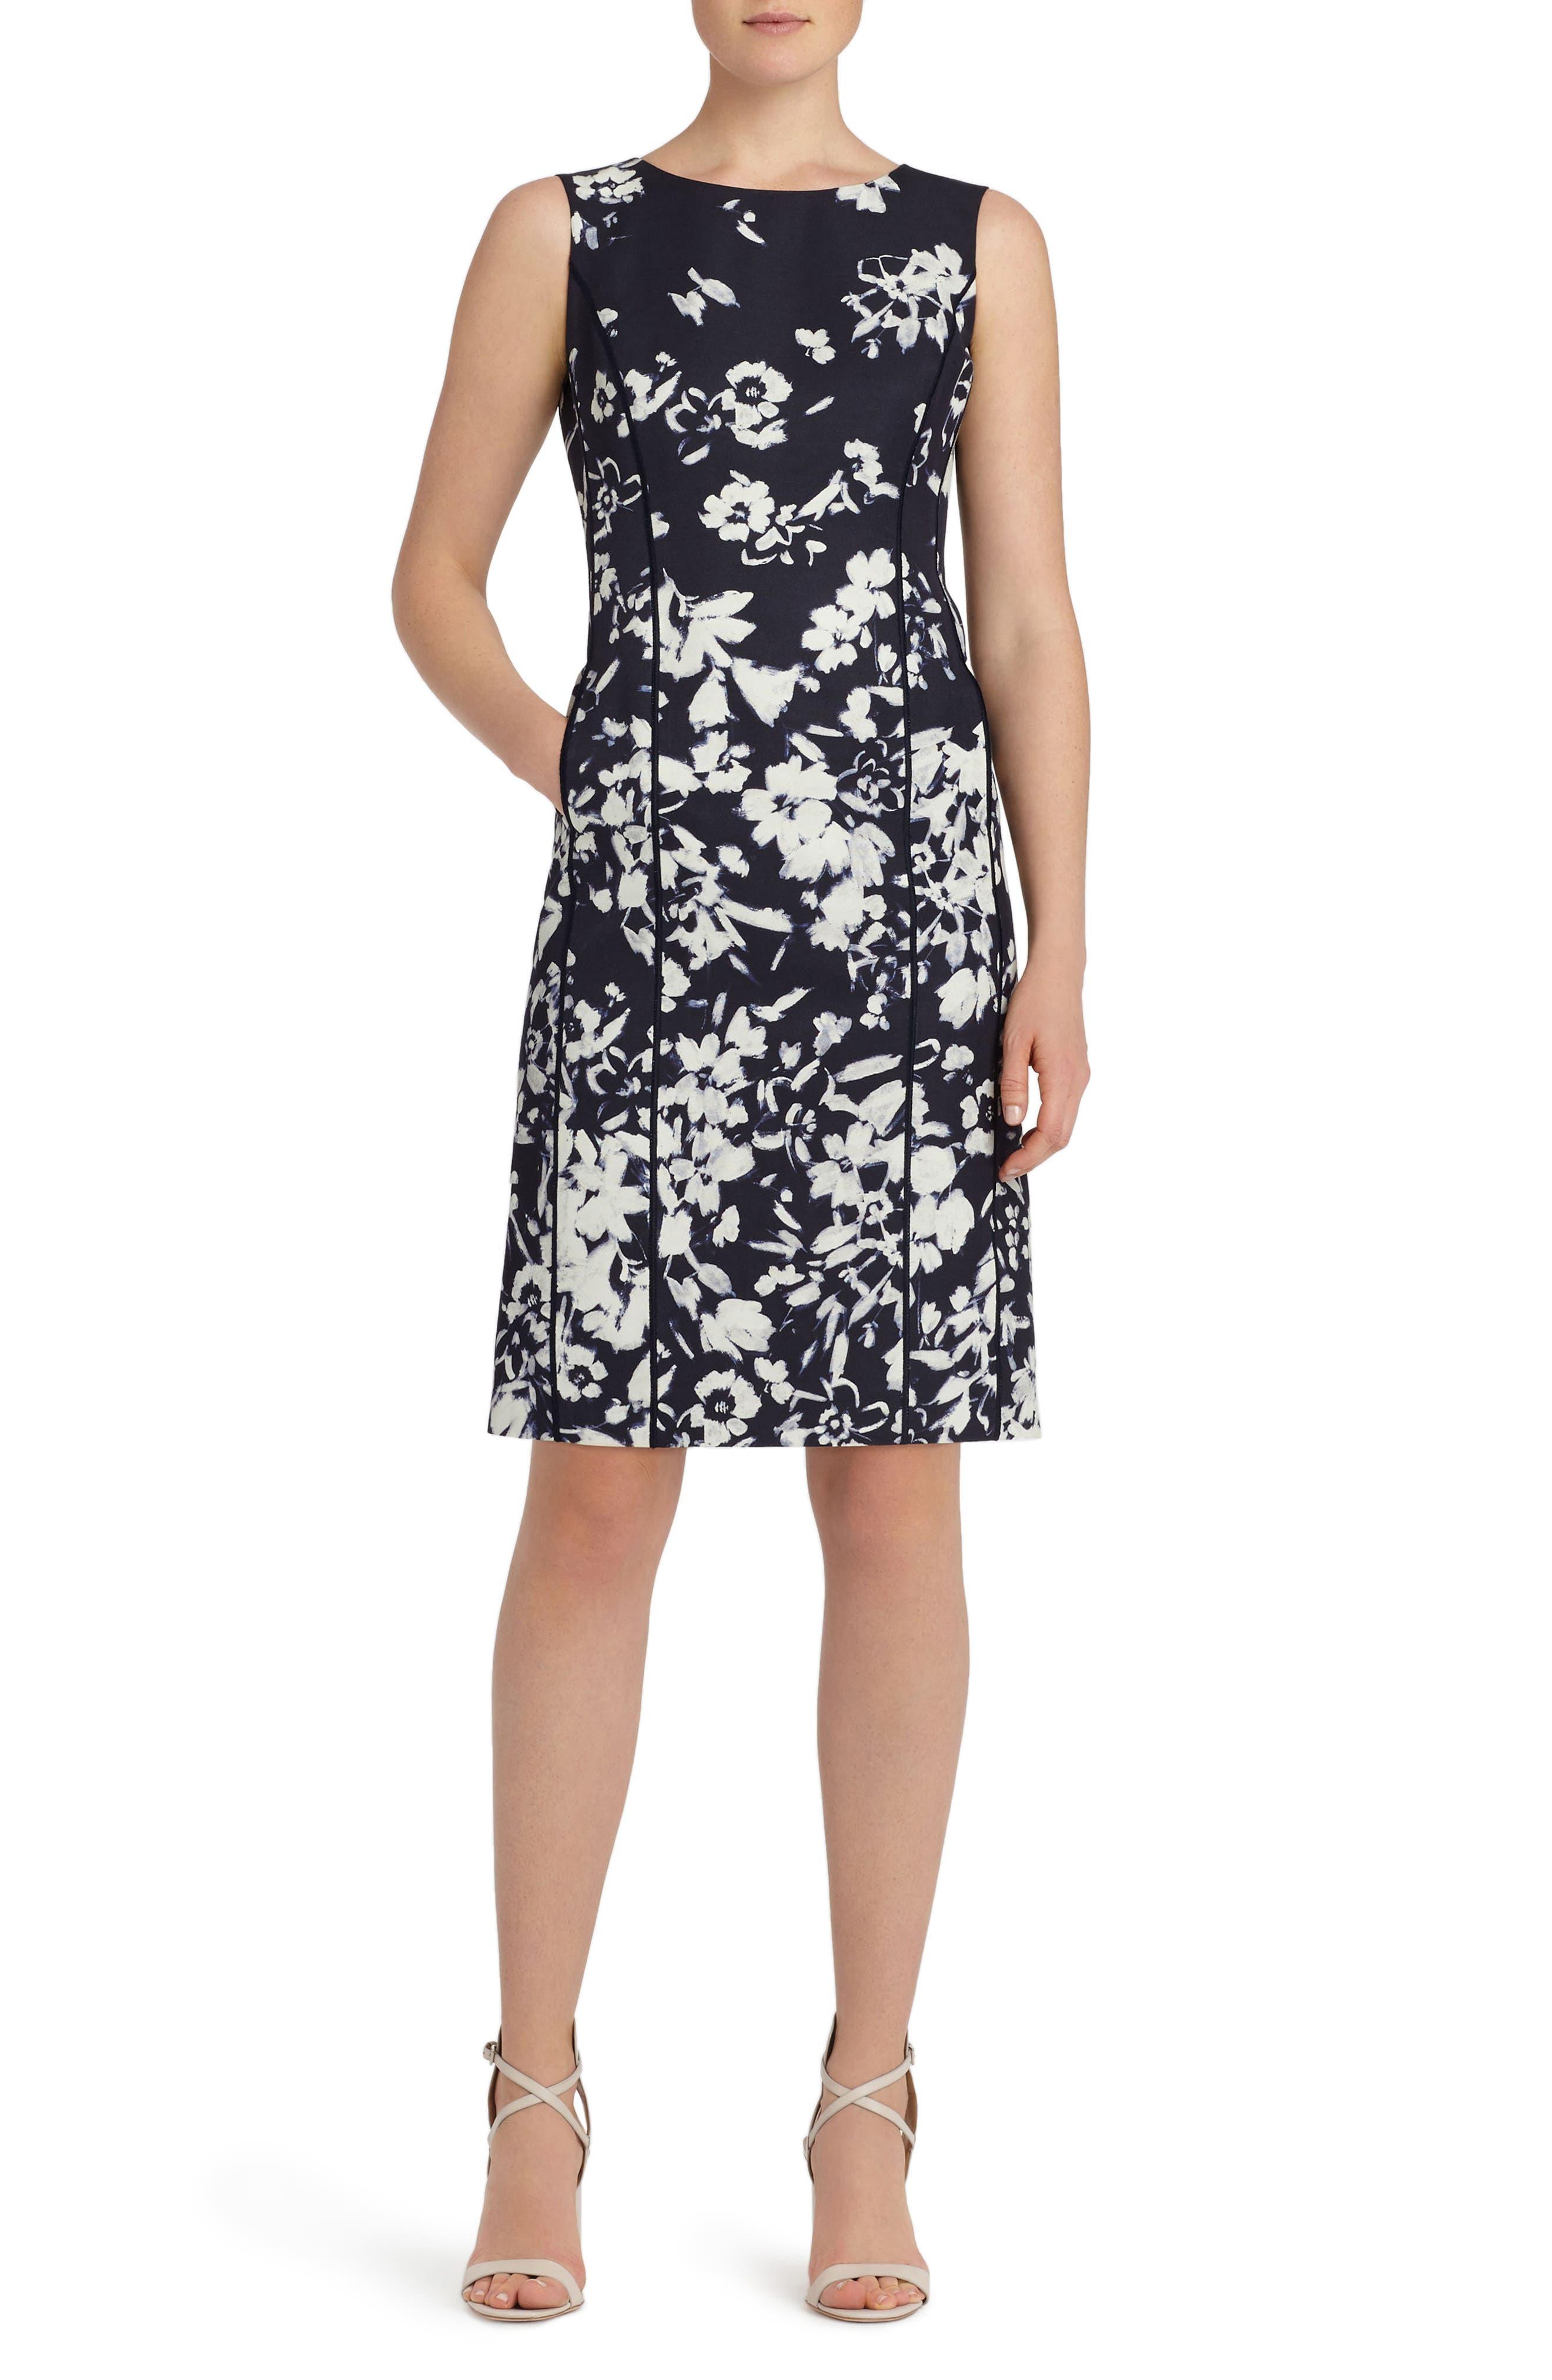 Alternate Image 1 Selected - Lafayette 148 New York Evelyn Print Sheath Dress